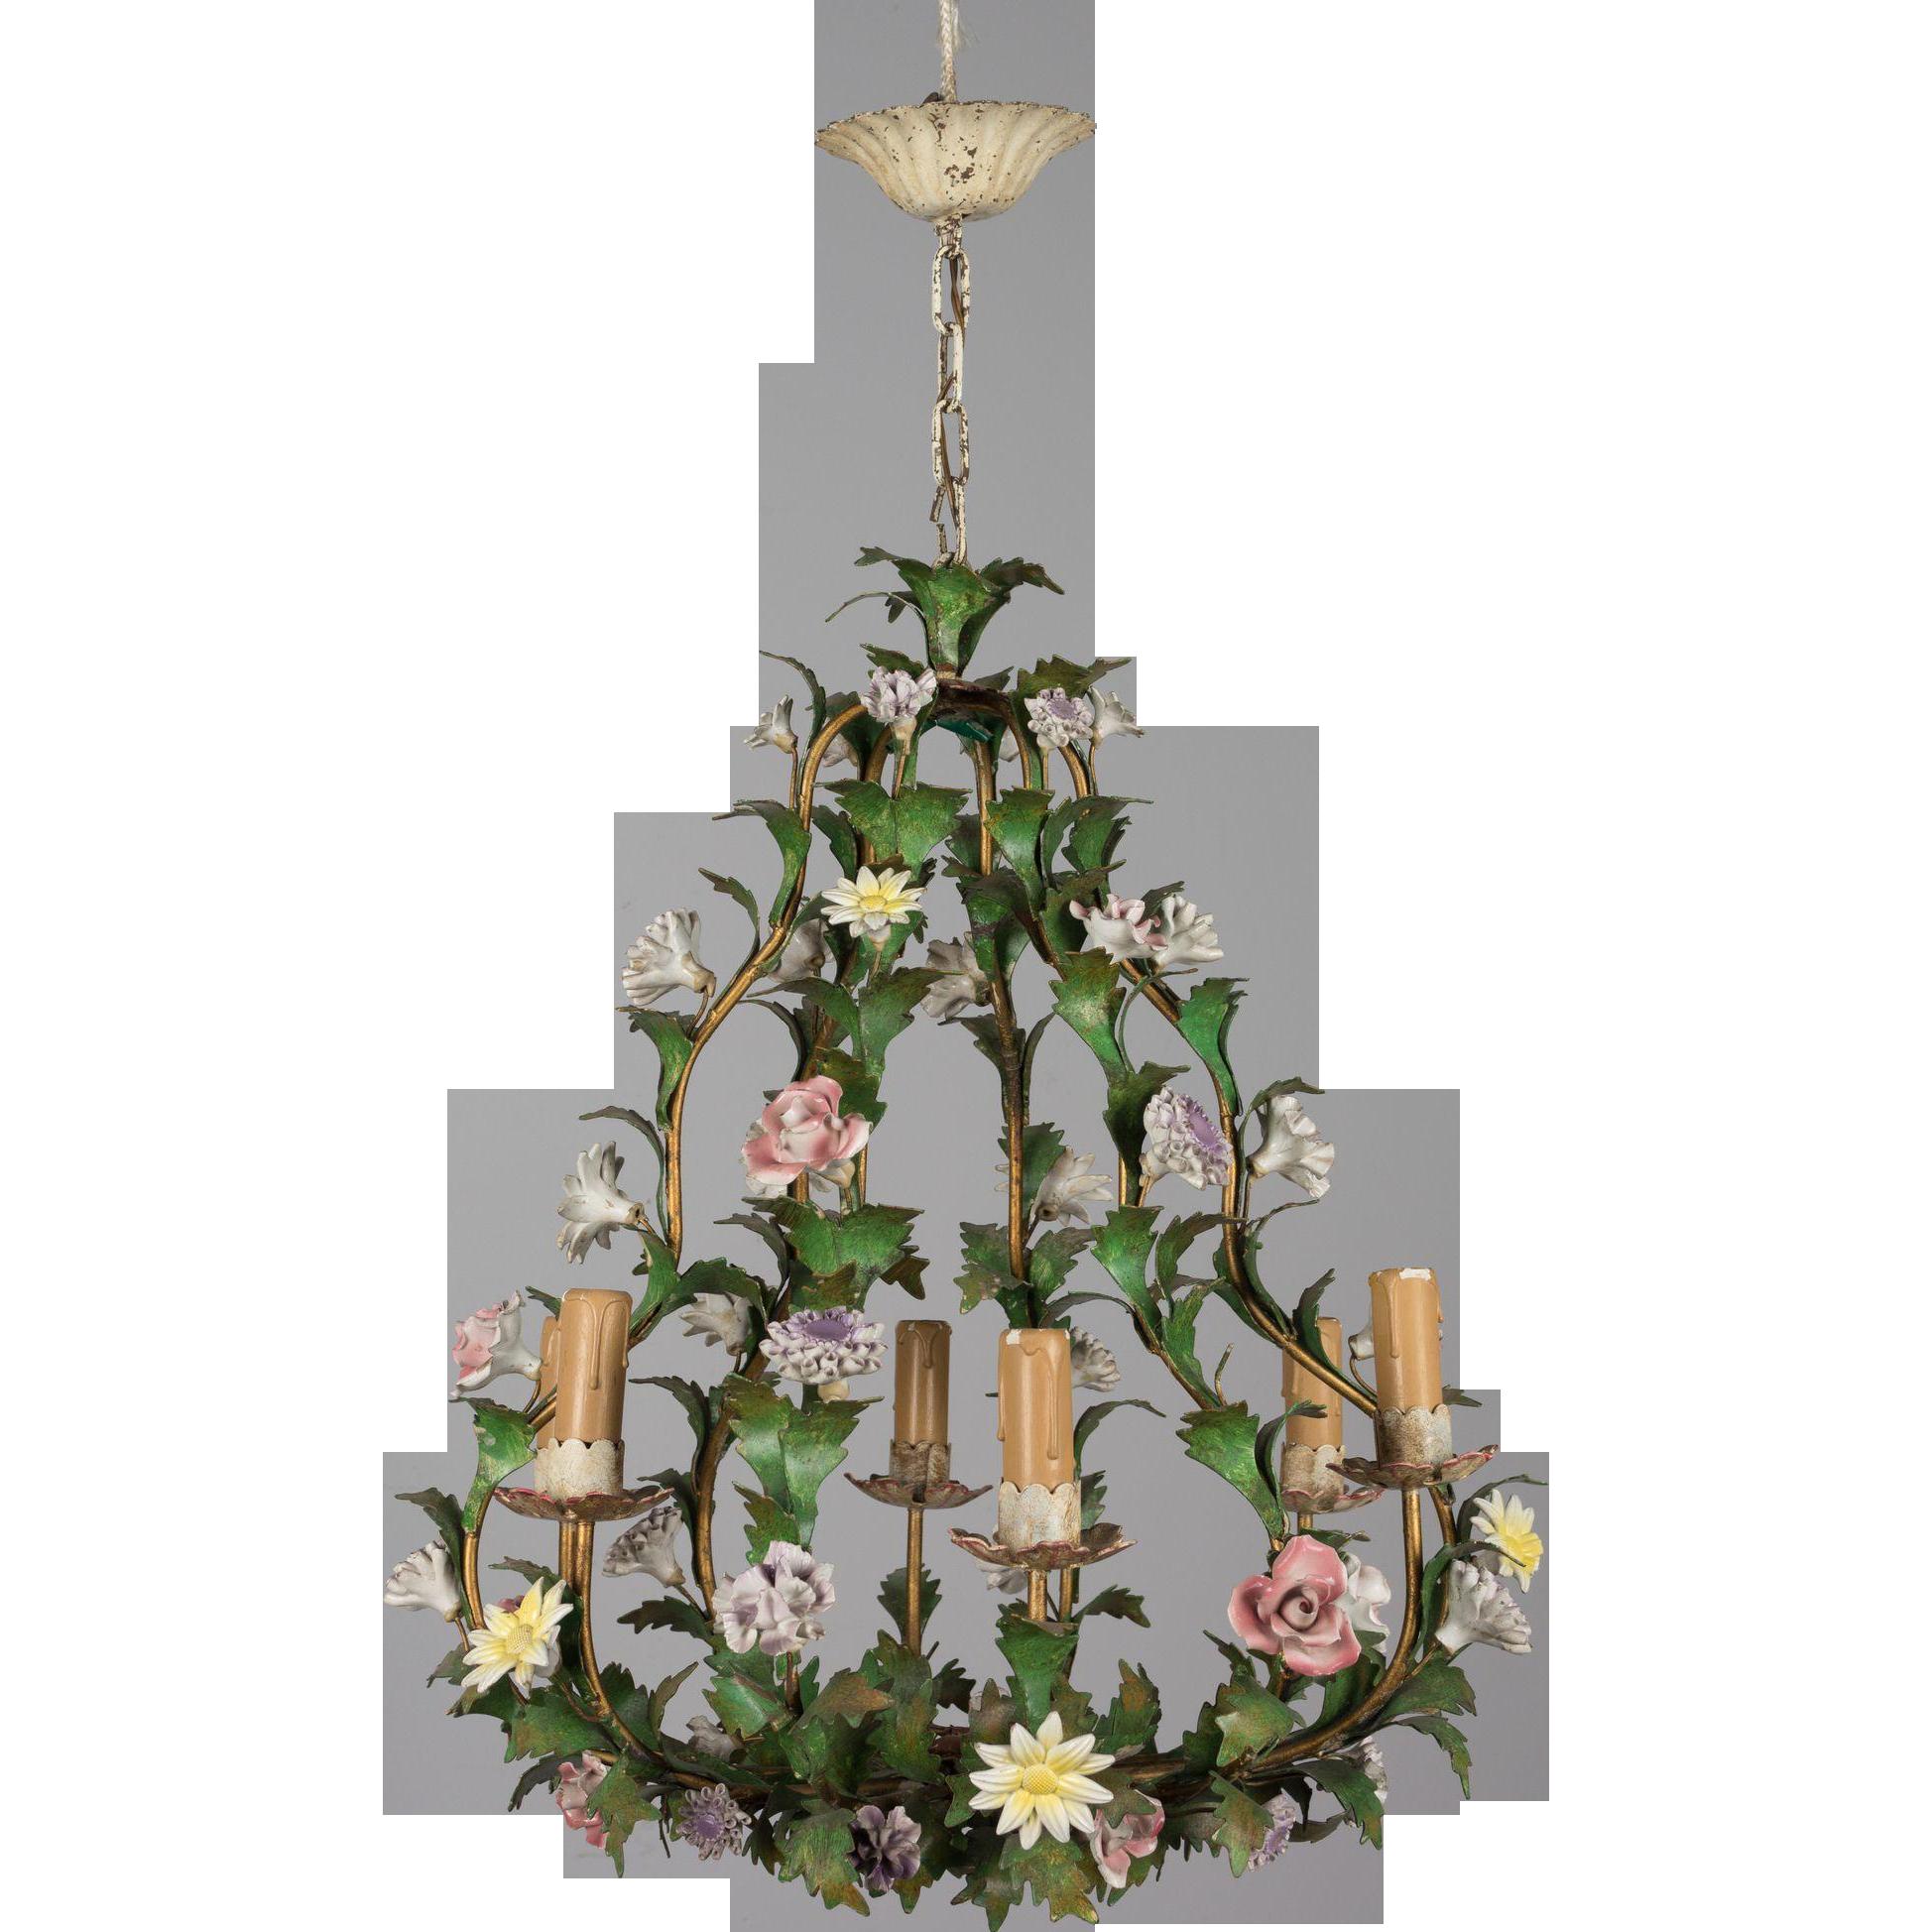 Italian Tole Chandelier with Porcelain Flowers Olivier Fleury